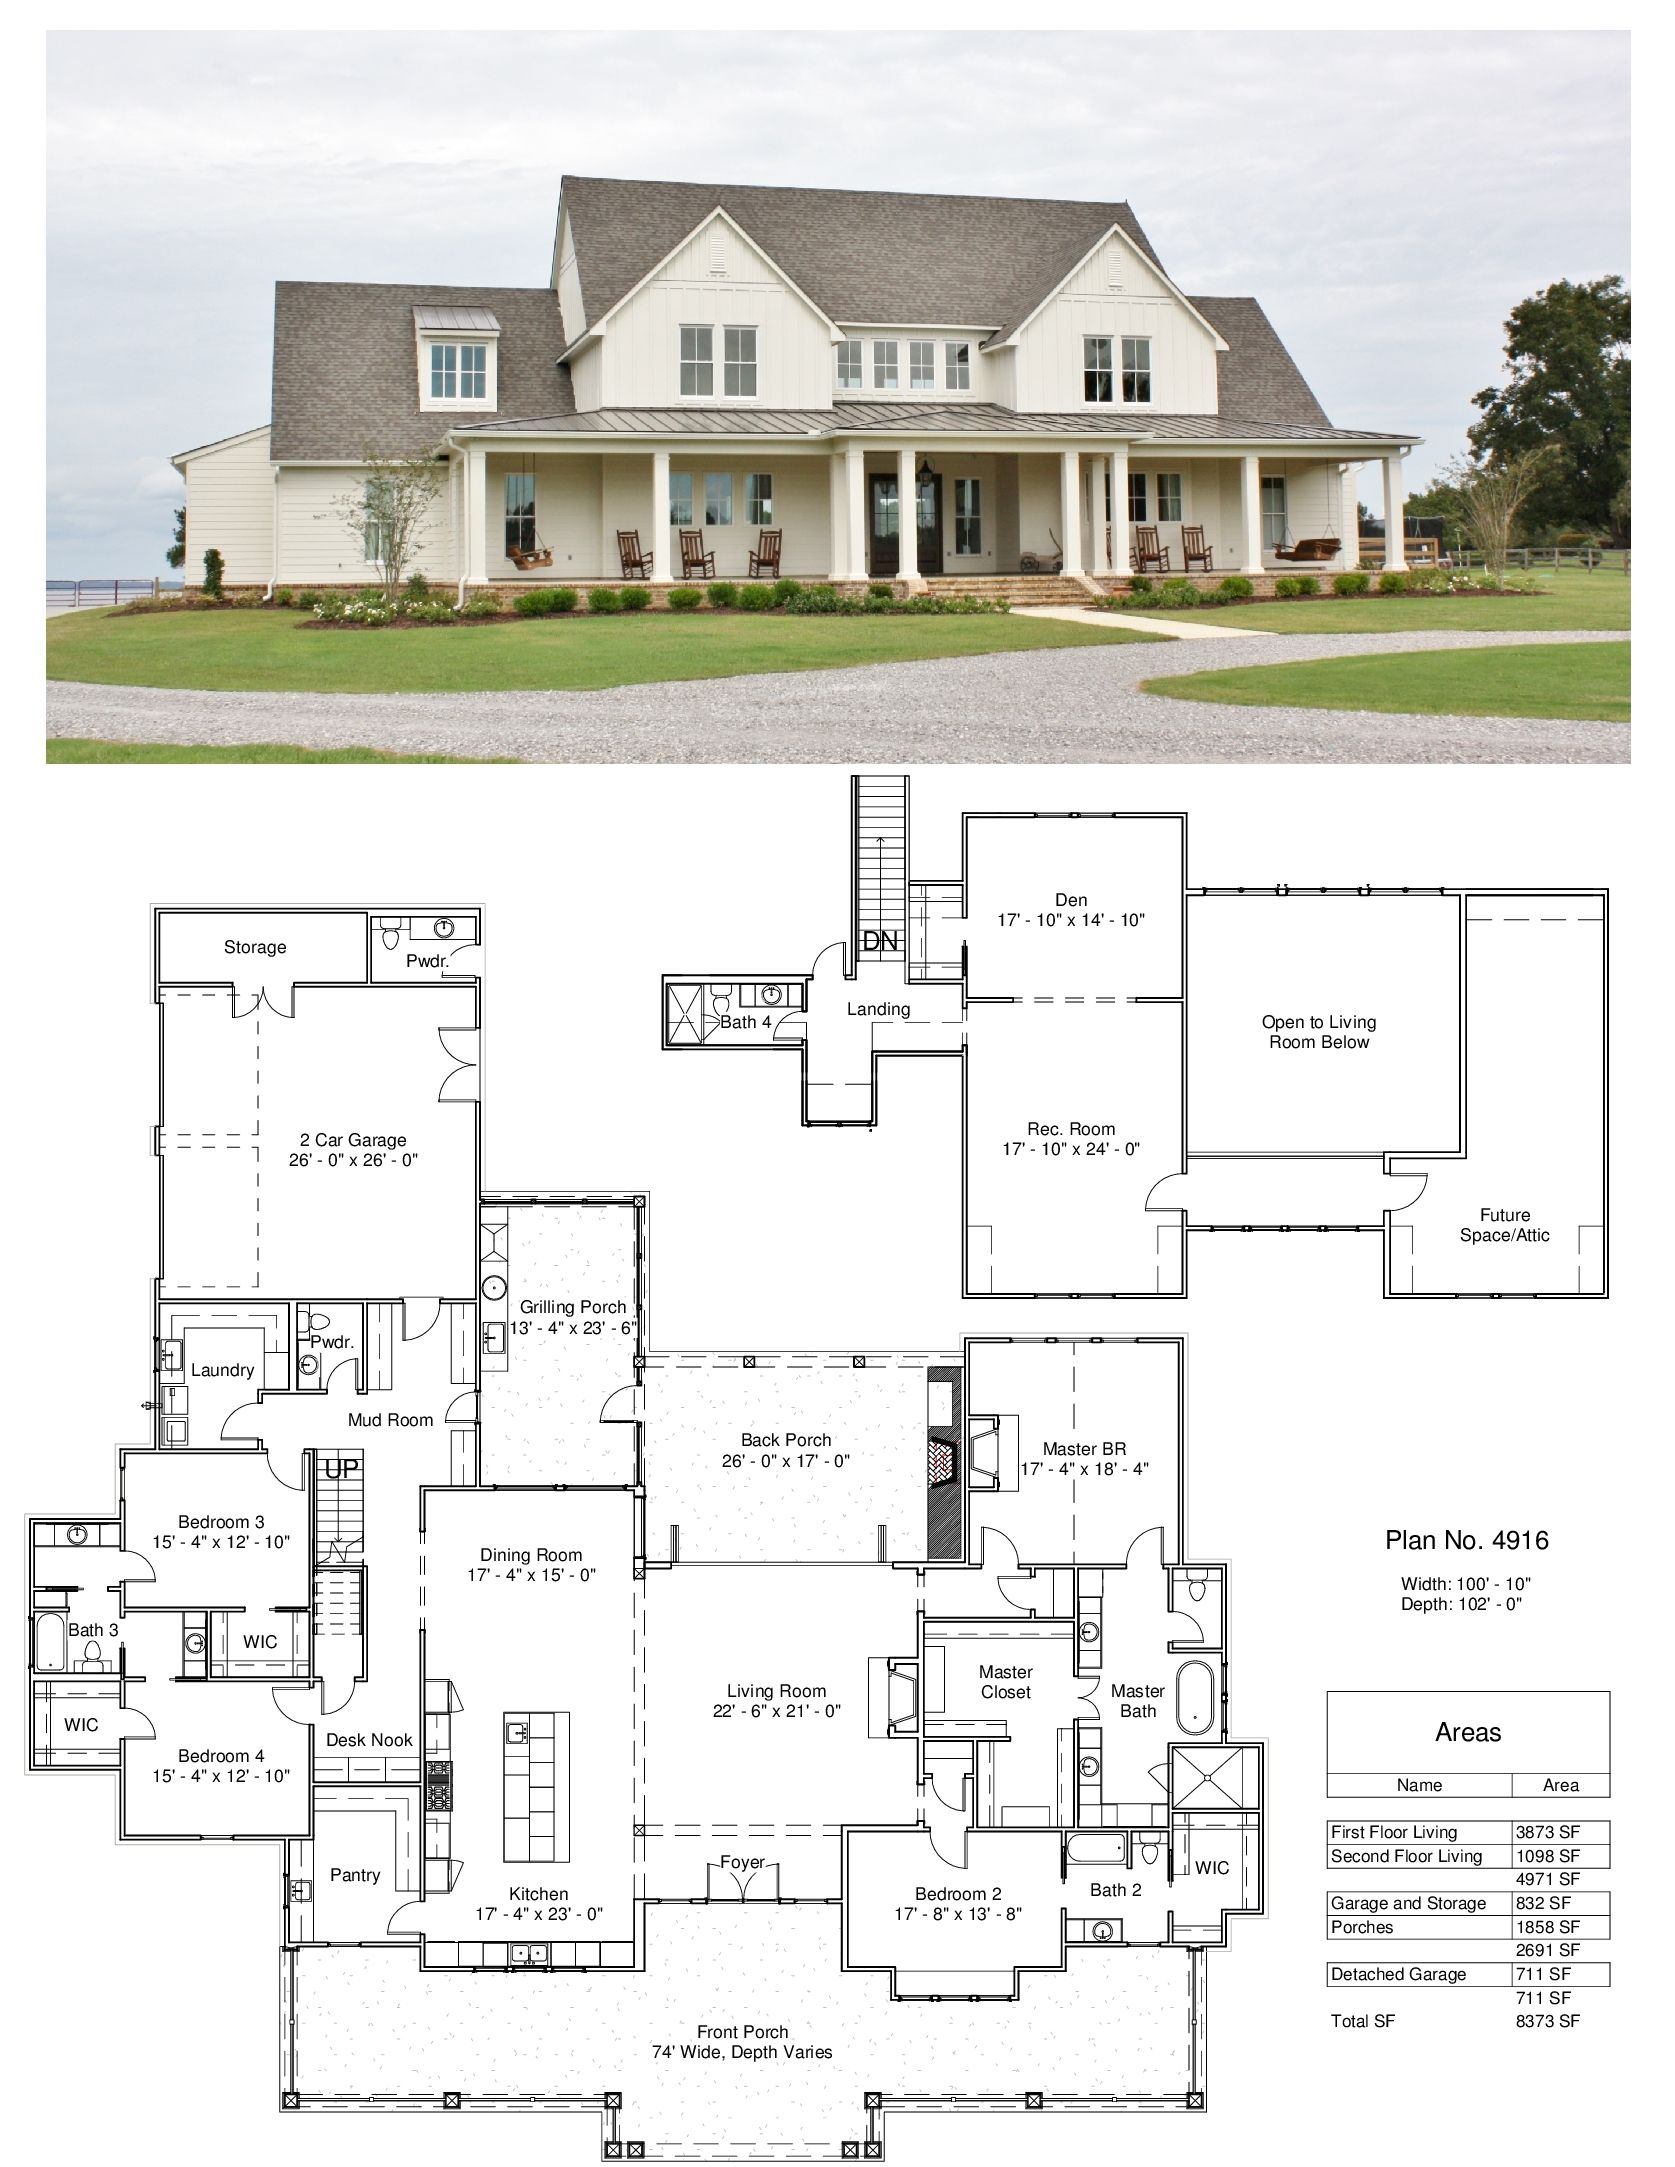 Plan 4916 Design Studio In 2020 House Plans Farmhouse House Plans New House Plans